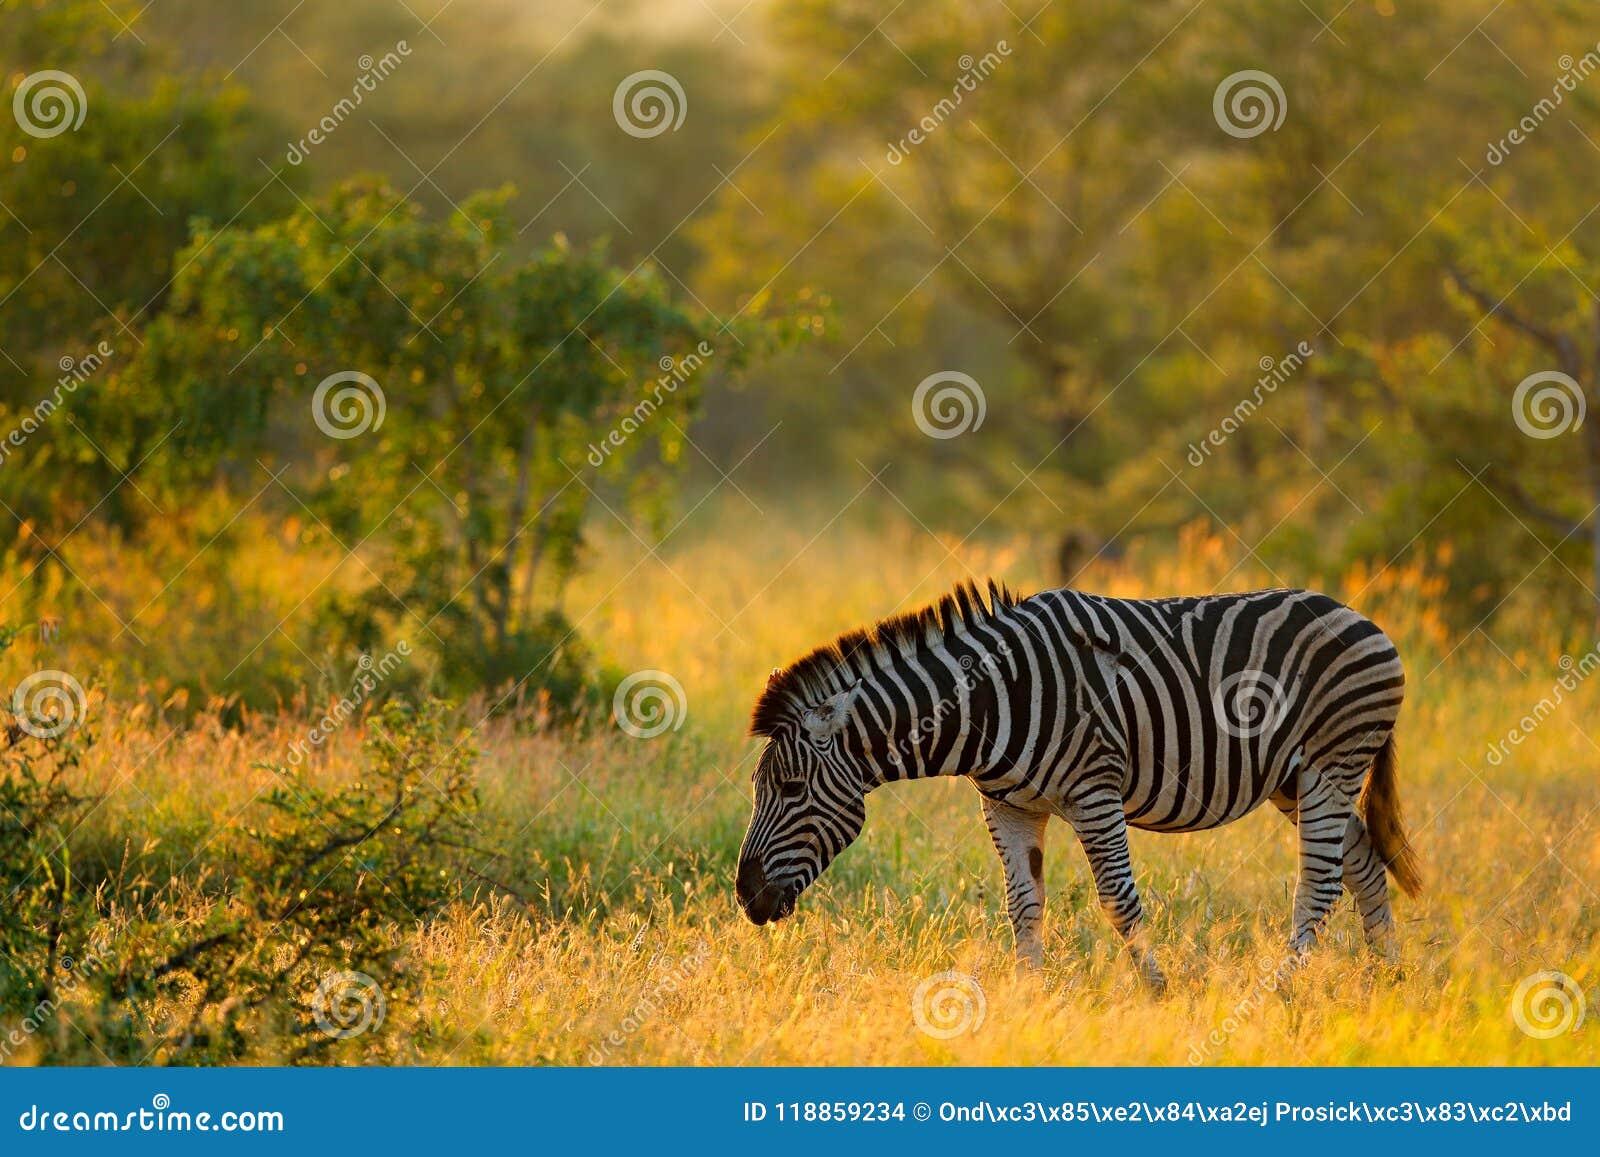 Plains zebra, Equus quagga, in the grassy nature habitat, evening light, Kruger National Park, South Africa. Wildlife scene from A